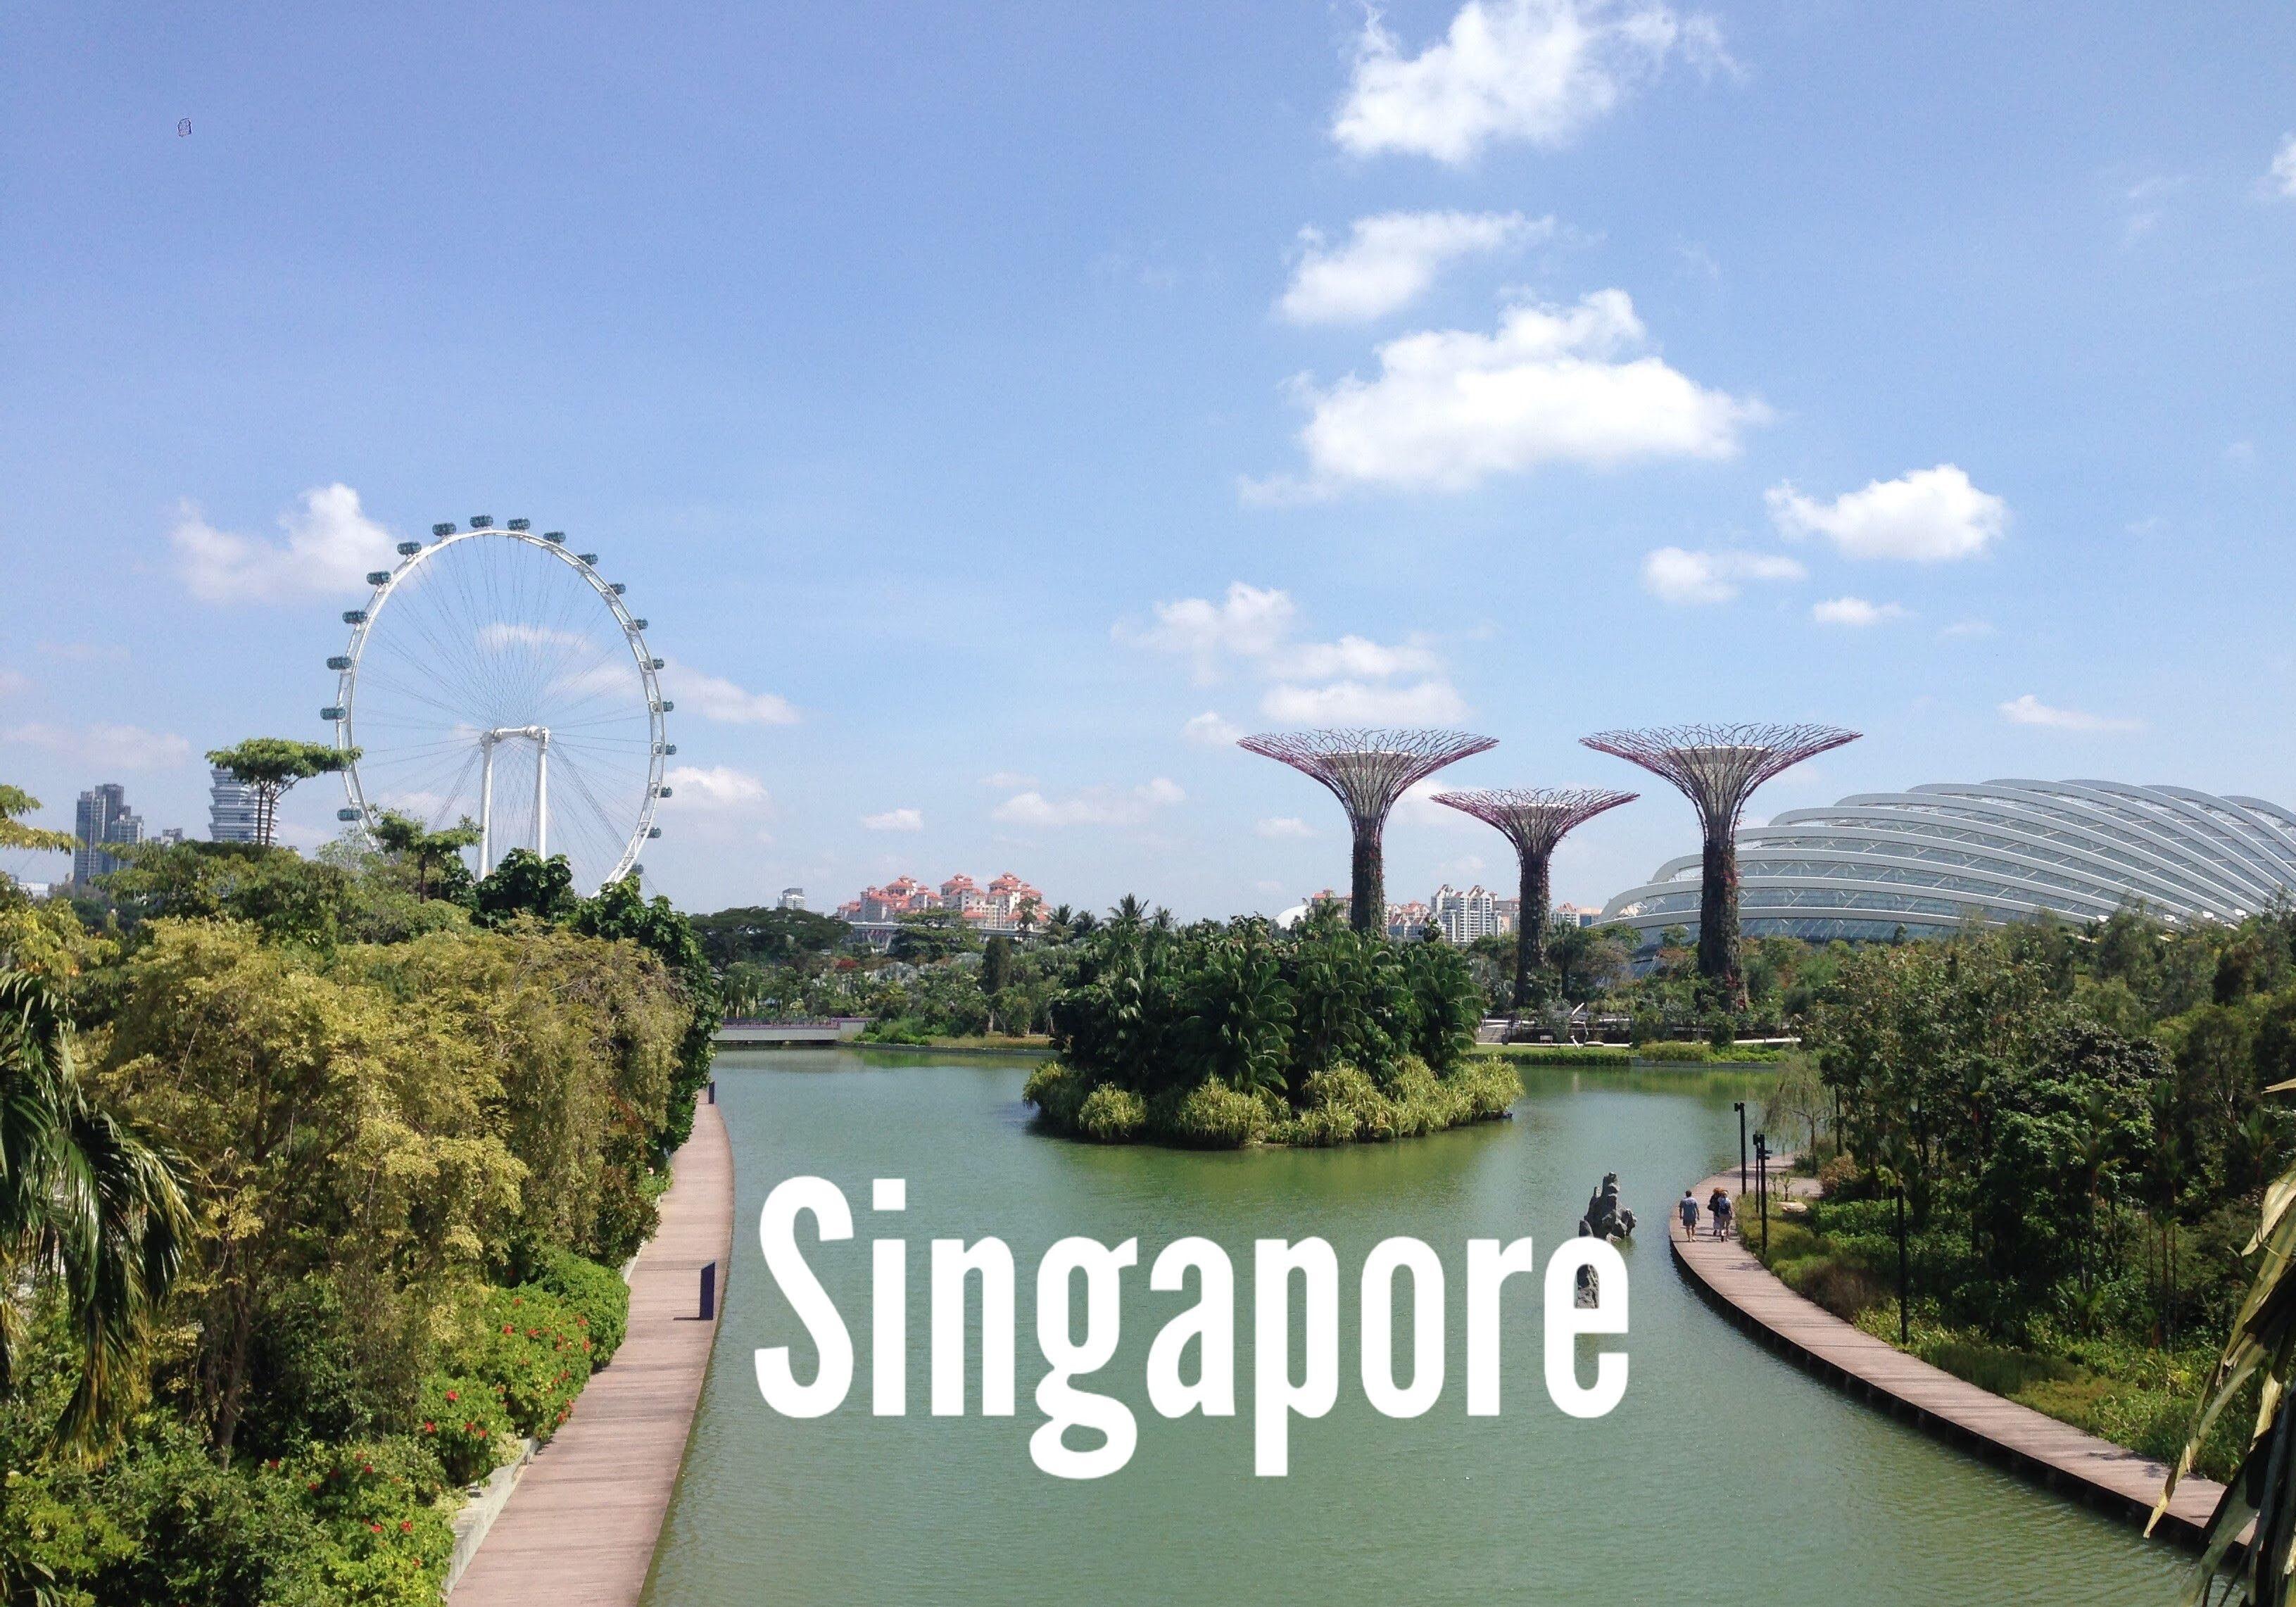 Singapore, wanderdaze, blog, travelling, travel blog,